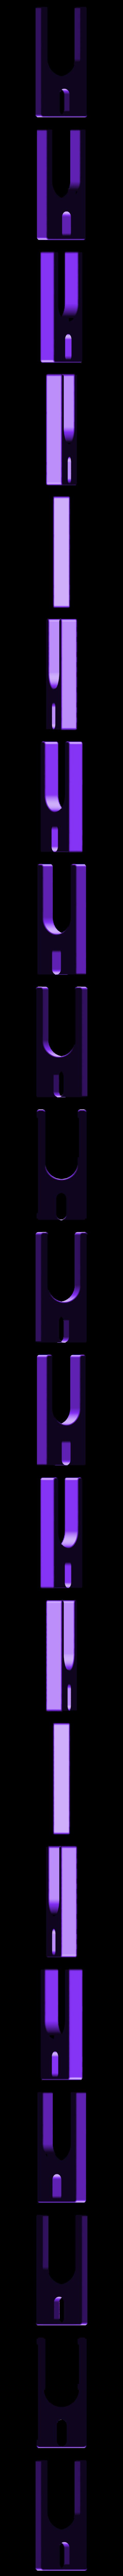 a6_hotend_2.stl Download free STL file Anet A6 J-Hotend mod • 3D printer object, Job